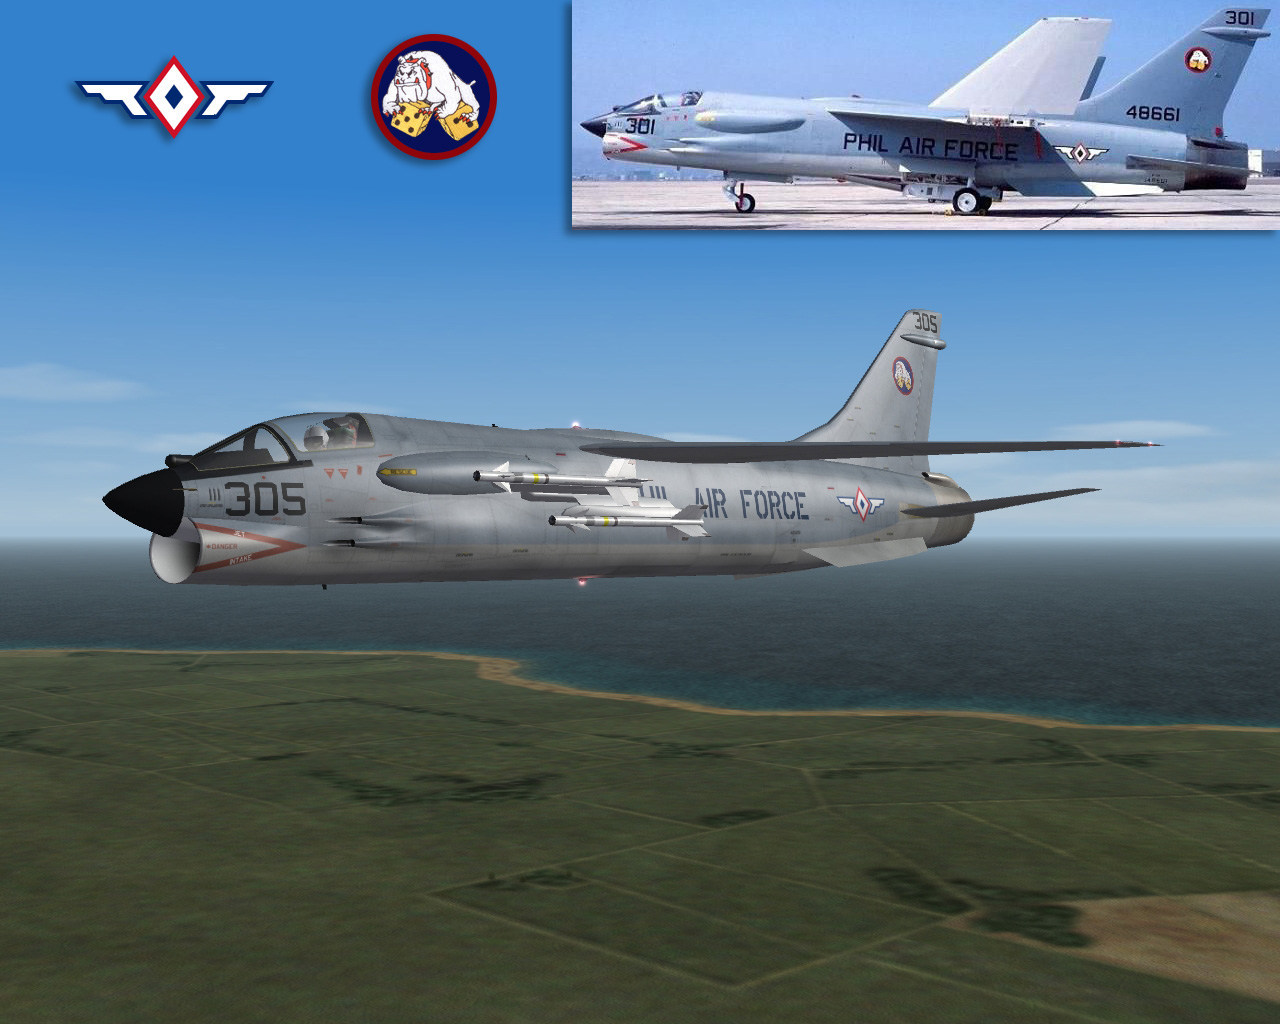 F-8H Phil Air Force skin